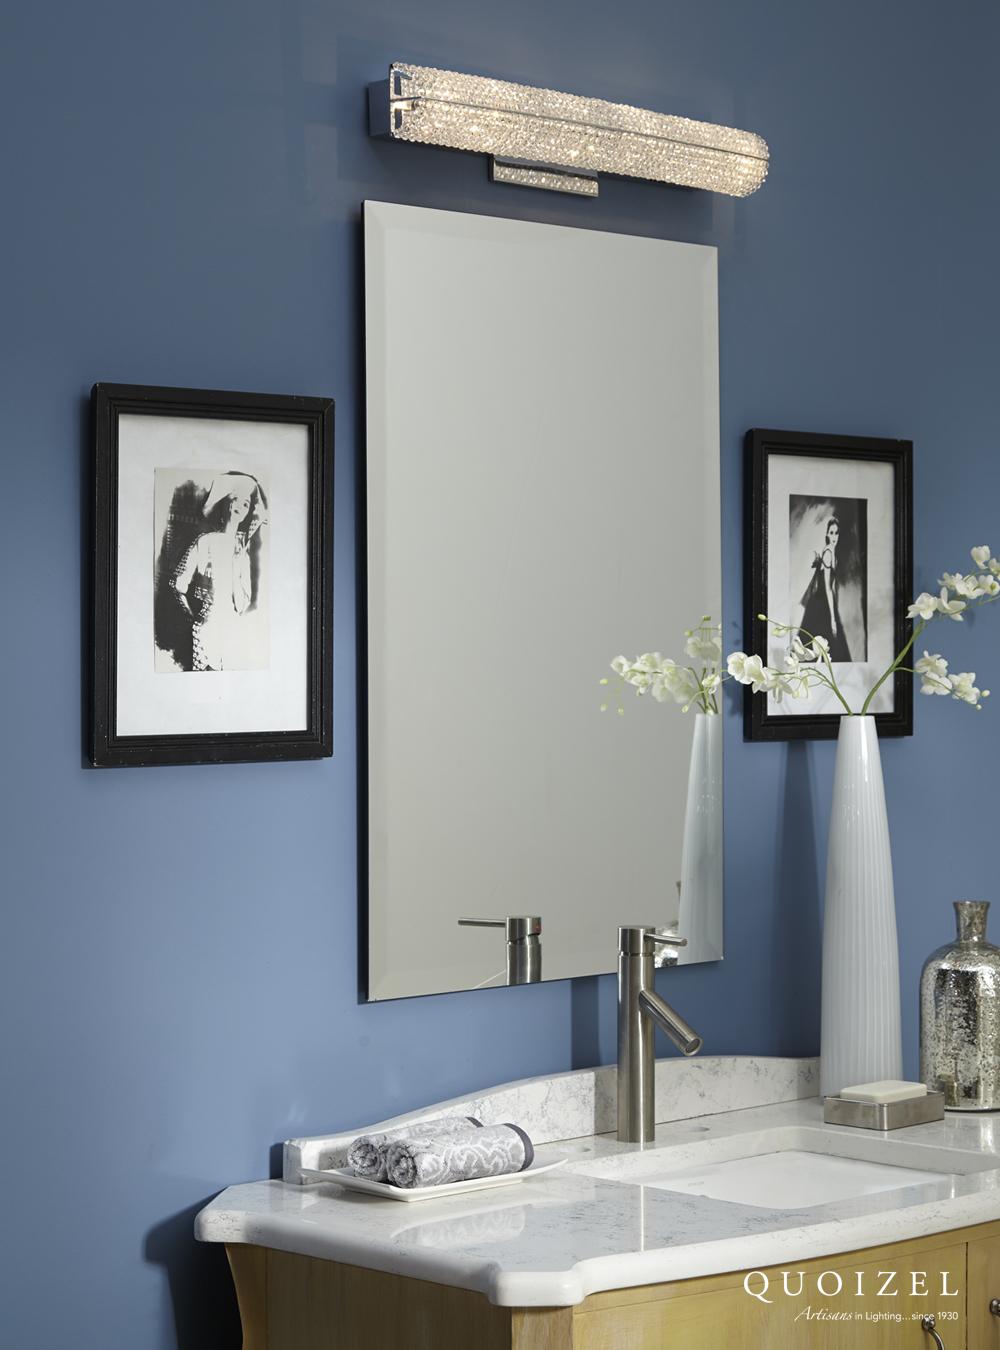 Quoizel Eme8604c Evermore Bath Bar Vanity 4 Light Xenon 80 throughout size 1000 X 1350